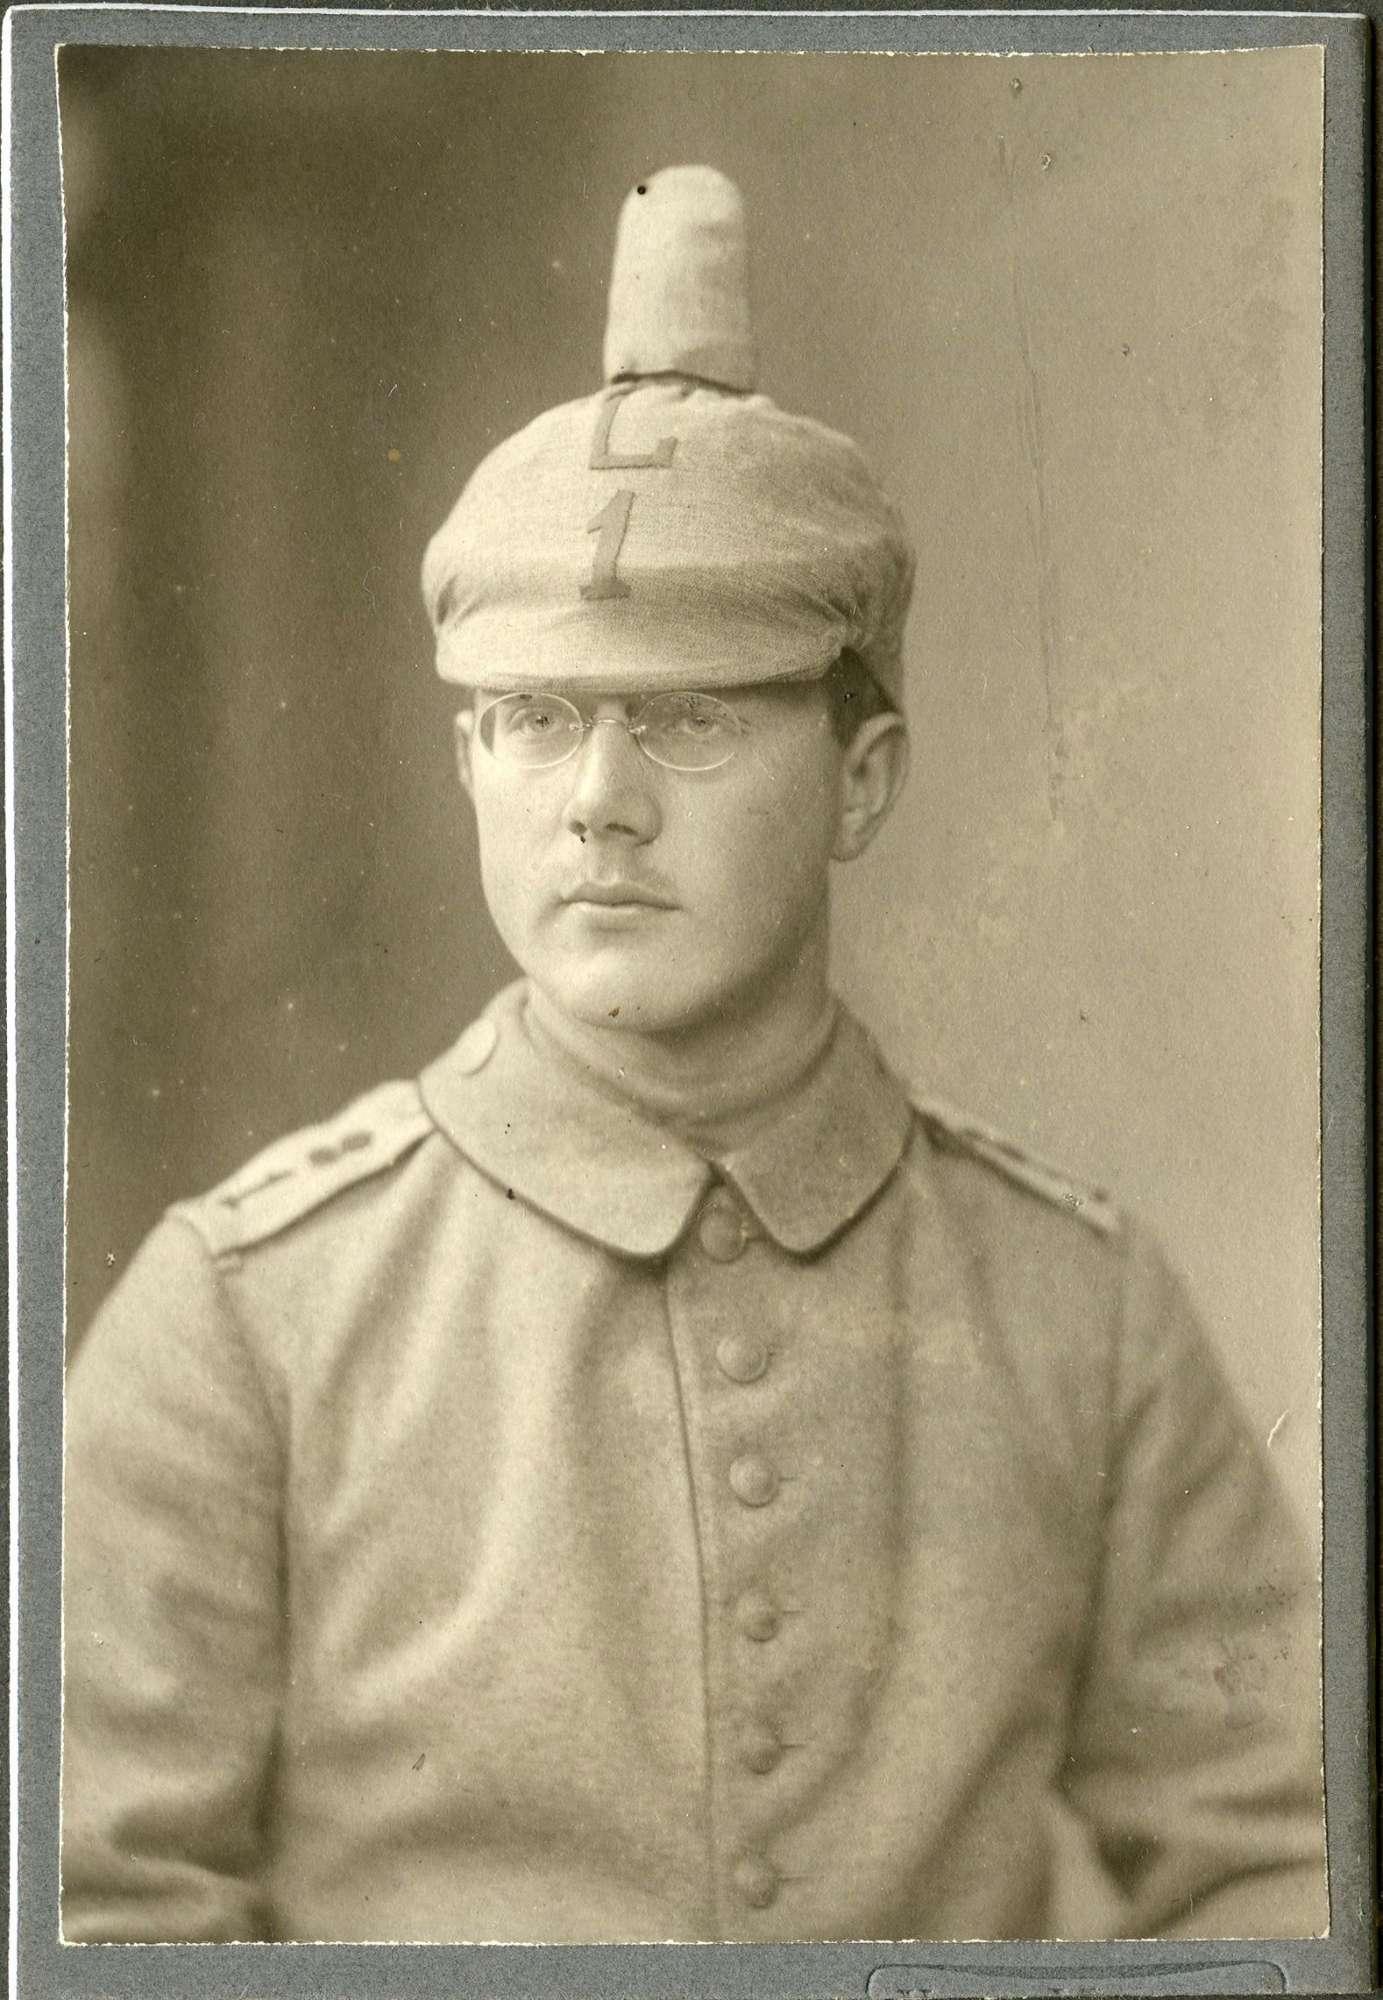 Stützel, Reinhold, Bild 1